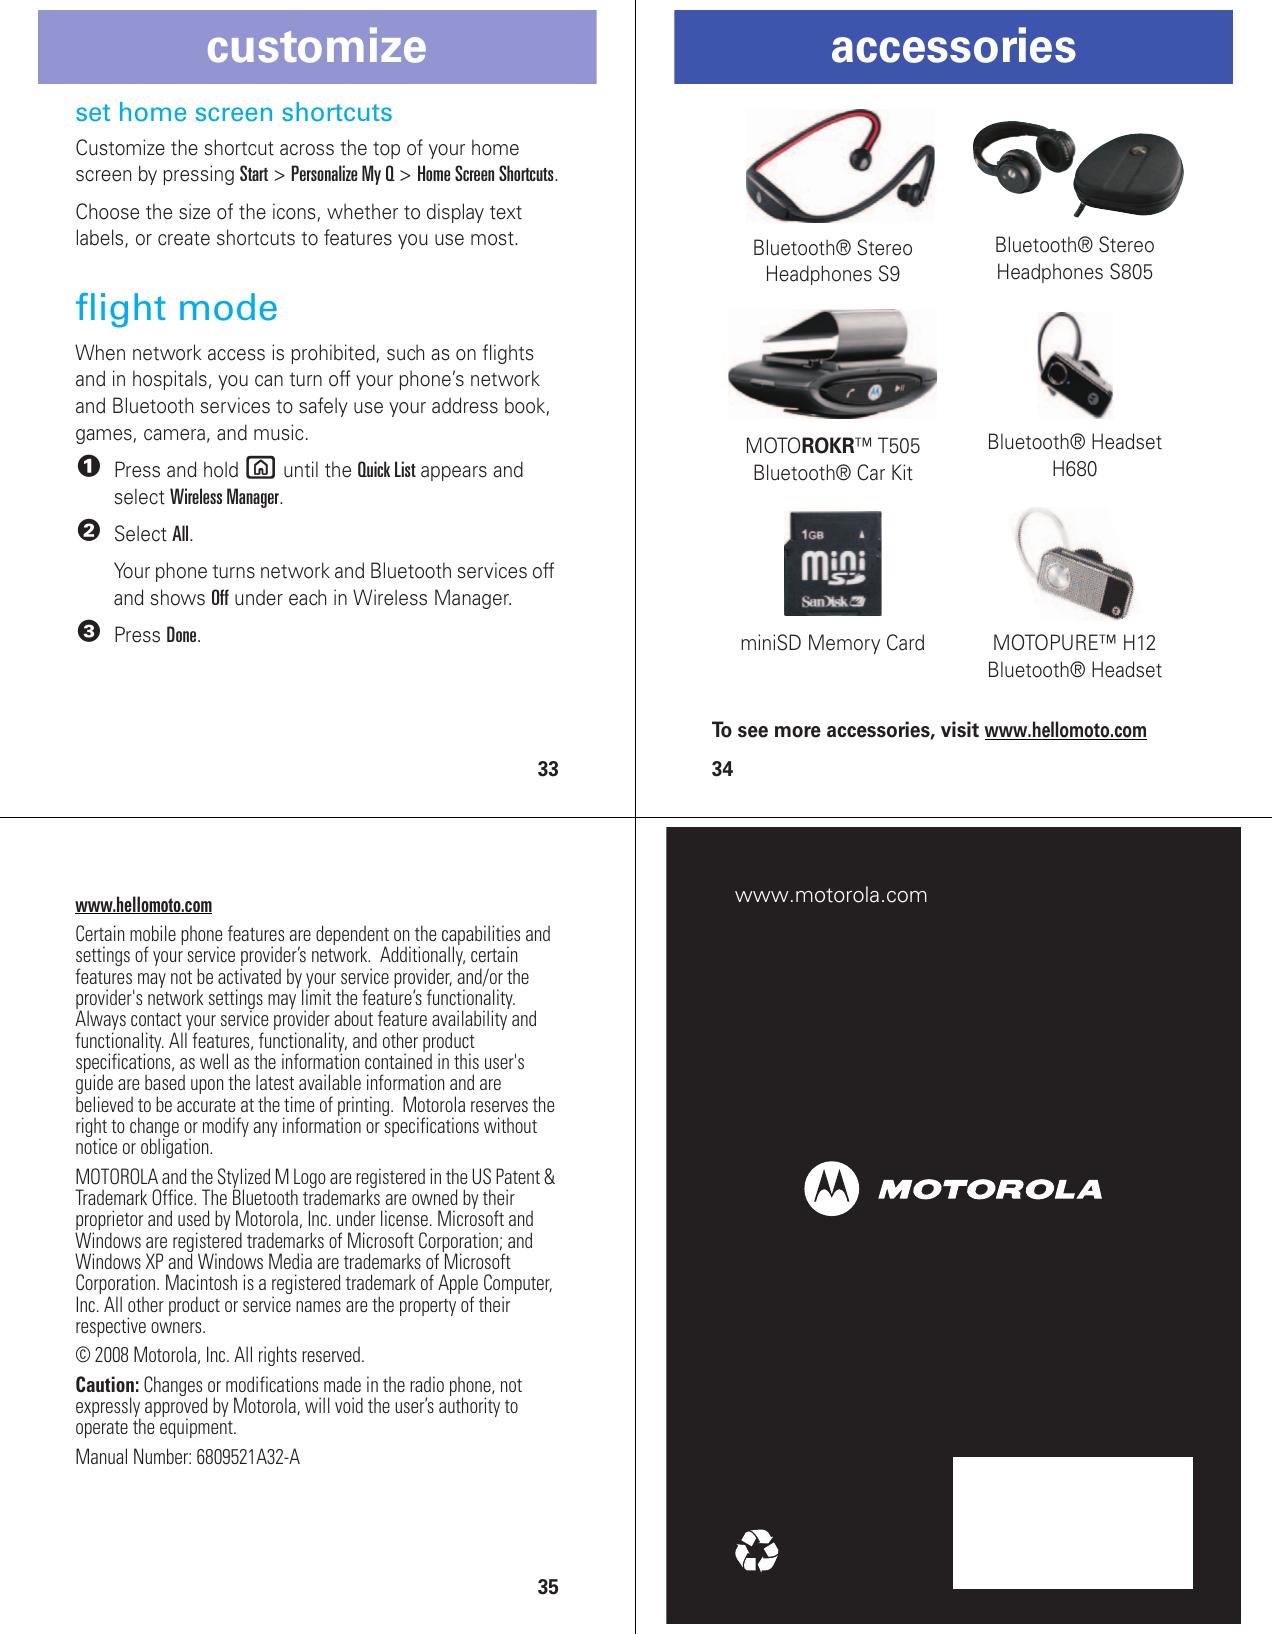 Motorola Moto Q 9m Manual Ebook Toro Timecutter Ss4235 Wiring Diagram Pdf Array User Guide Rh Logoutev De